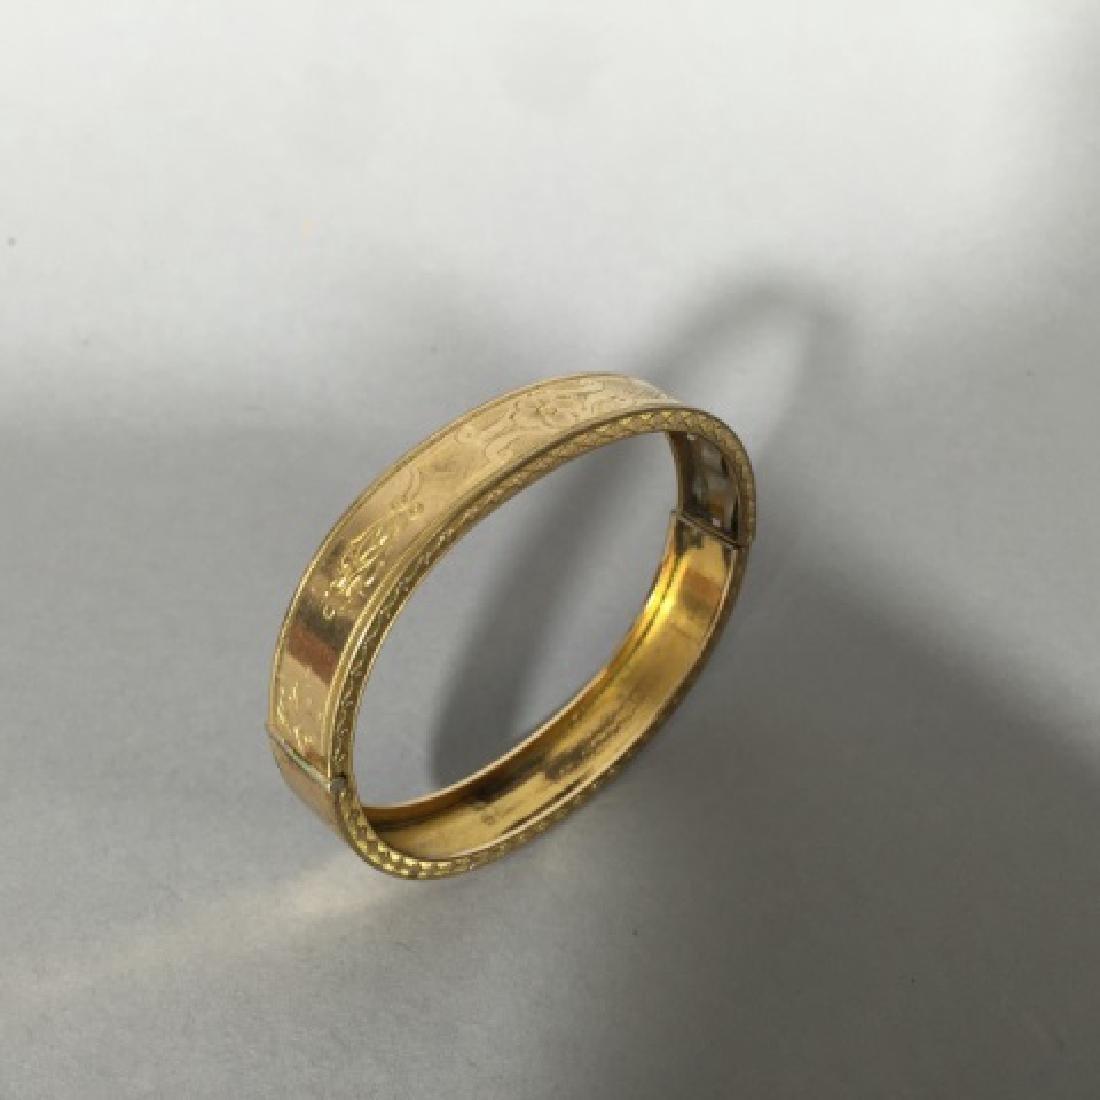 Antique 19th C Victorian Gold Bangle Bracelet - 4